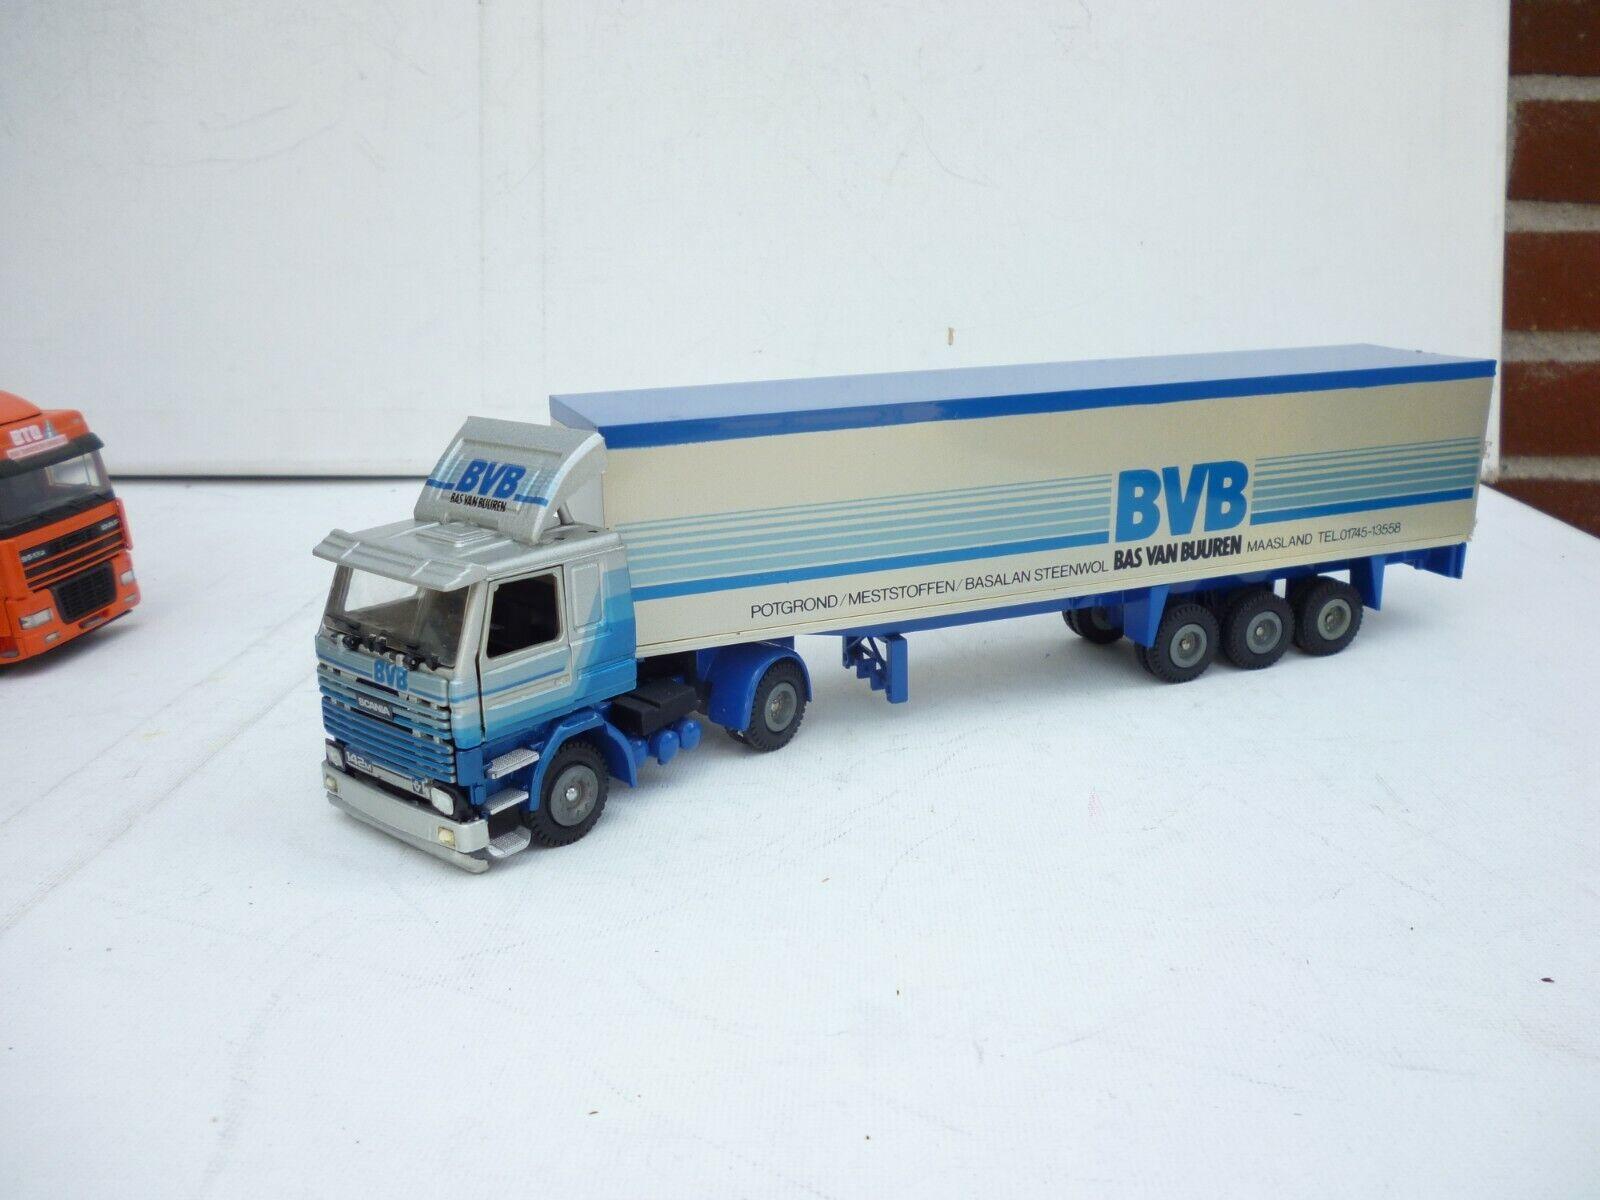 envio rapido a ti 1 50 TEKNO TEKNO TEKNO Scania 142 M V-8 BVB Bas Van Buren Maasland  Good Condition  Envío y cambio gratis.